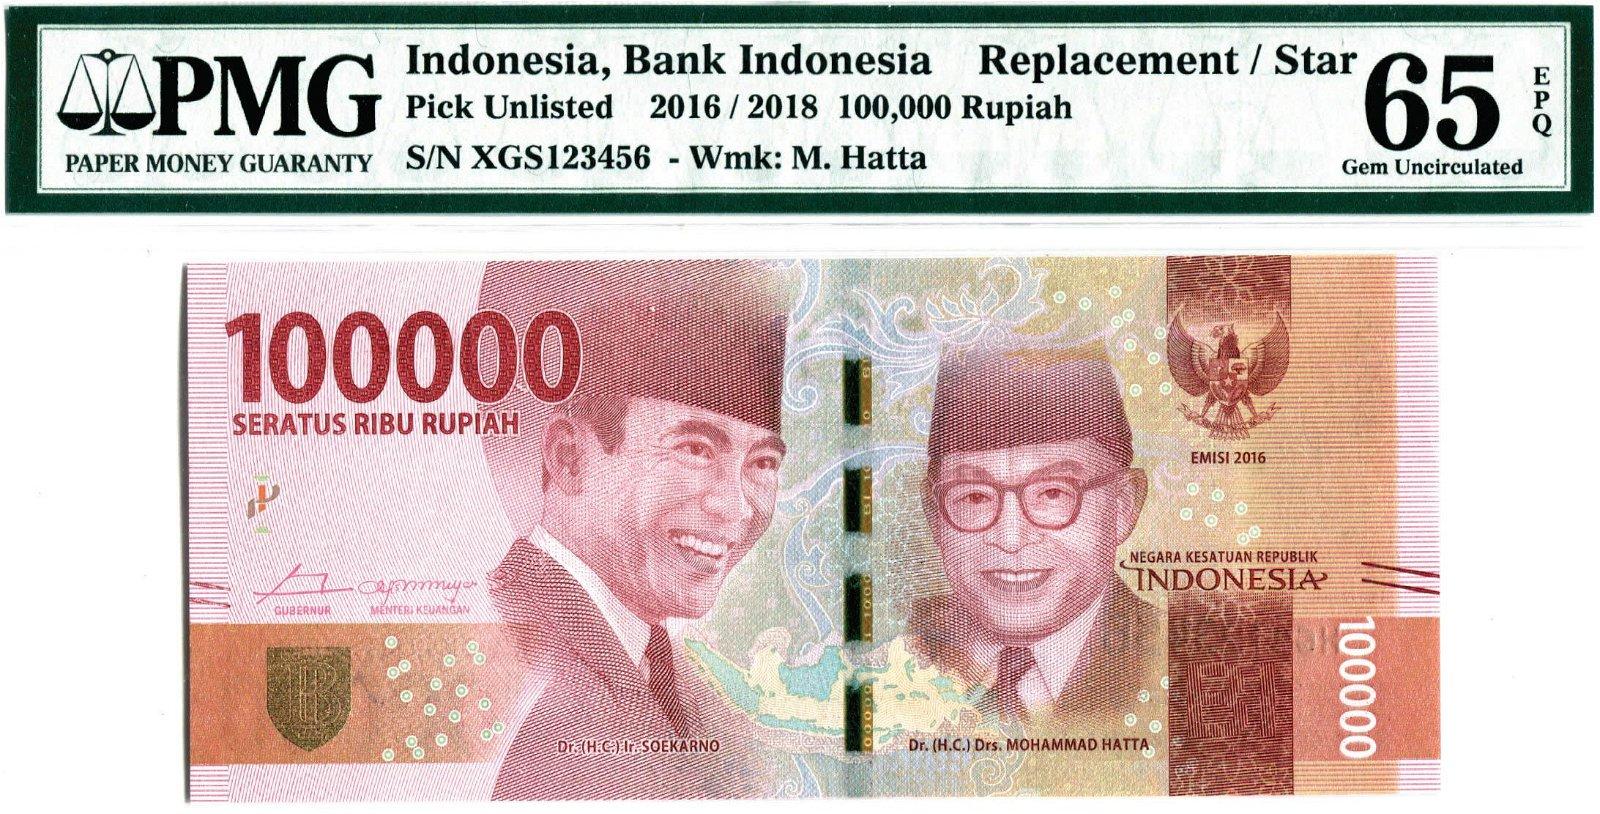 Indonesia 2016/18, 100,000 Rupiah,  Replacement/ Star,